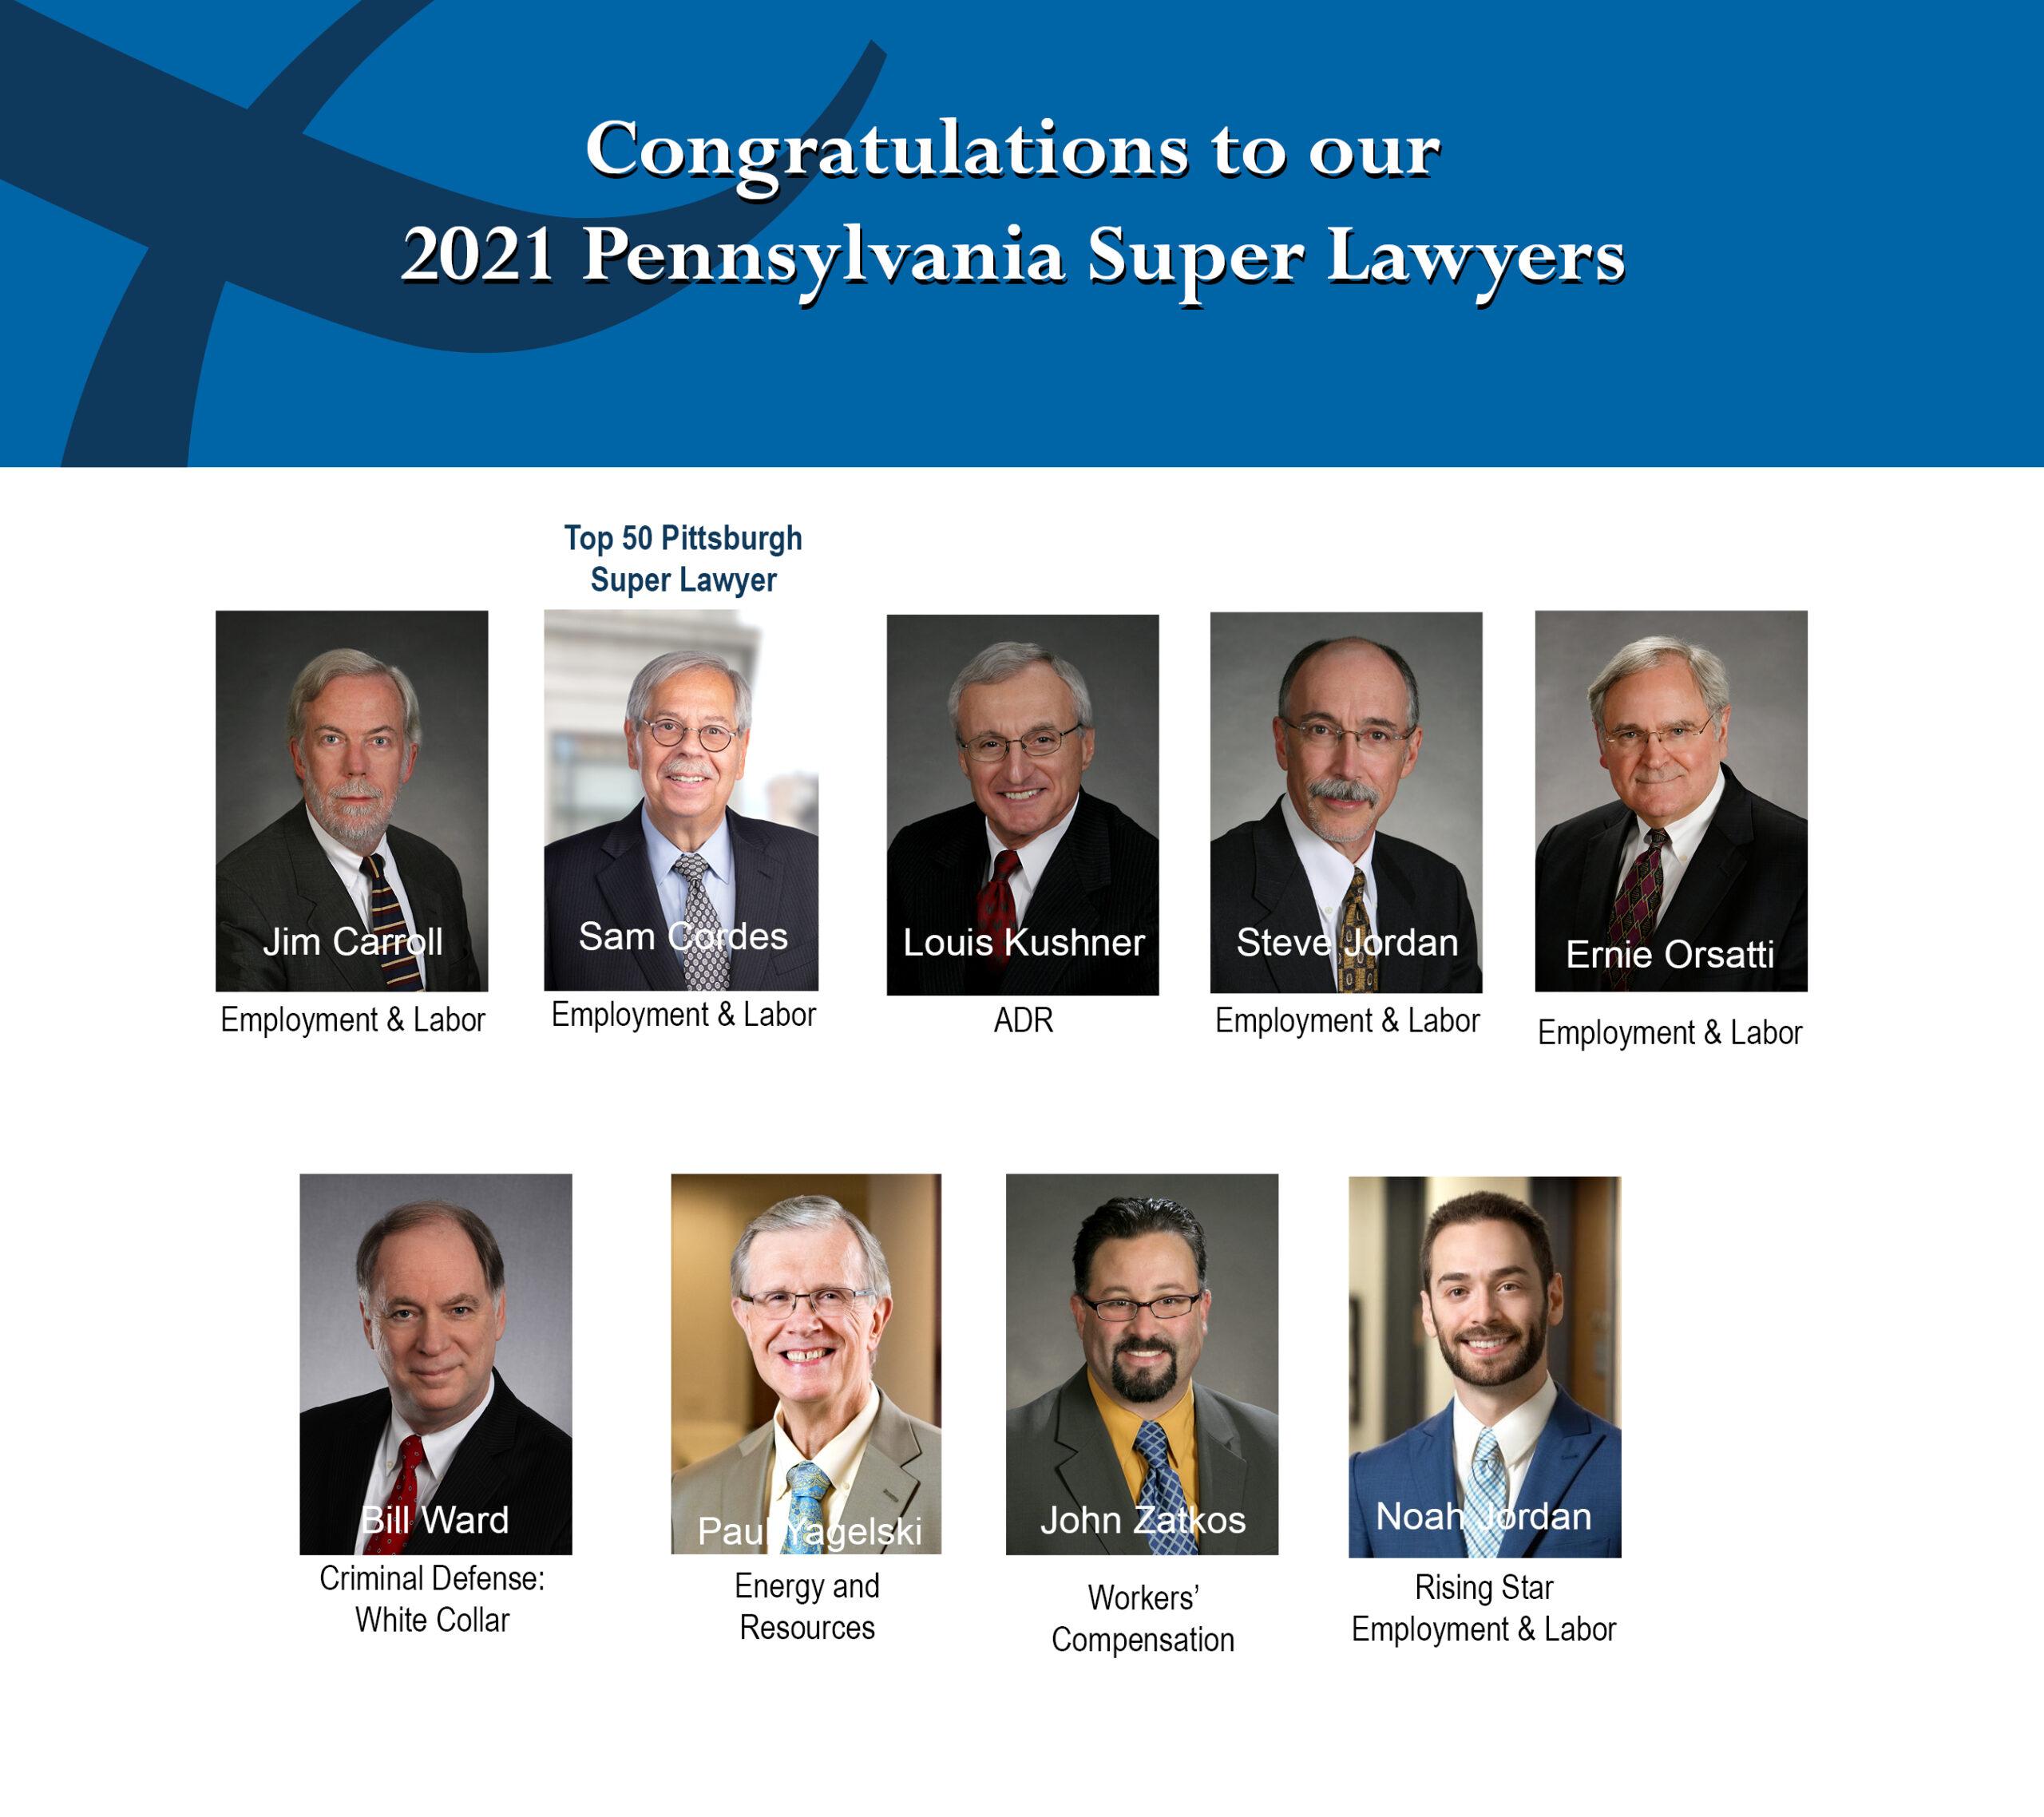 9 Super Lawyers